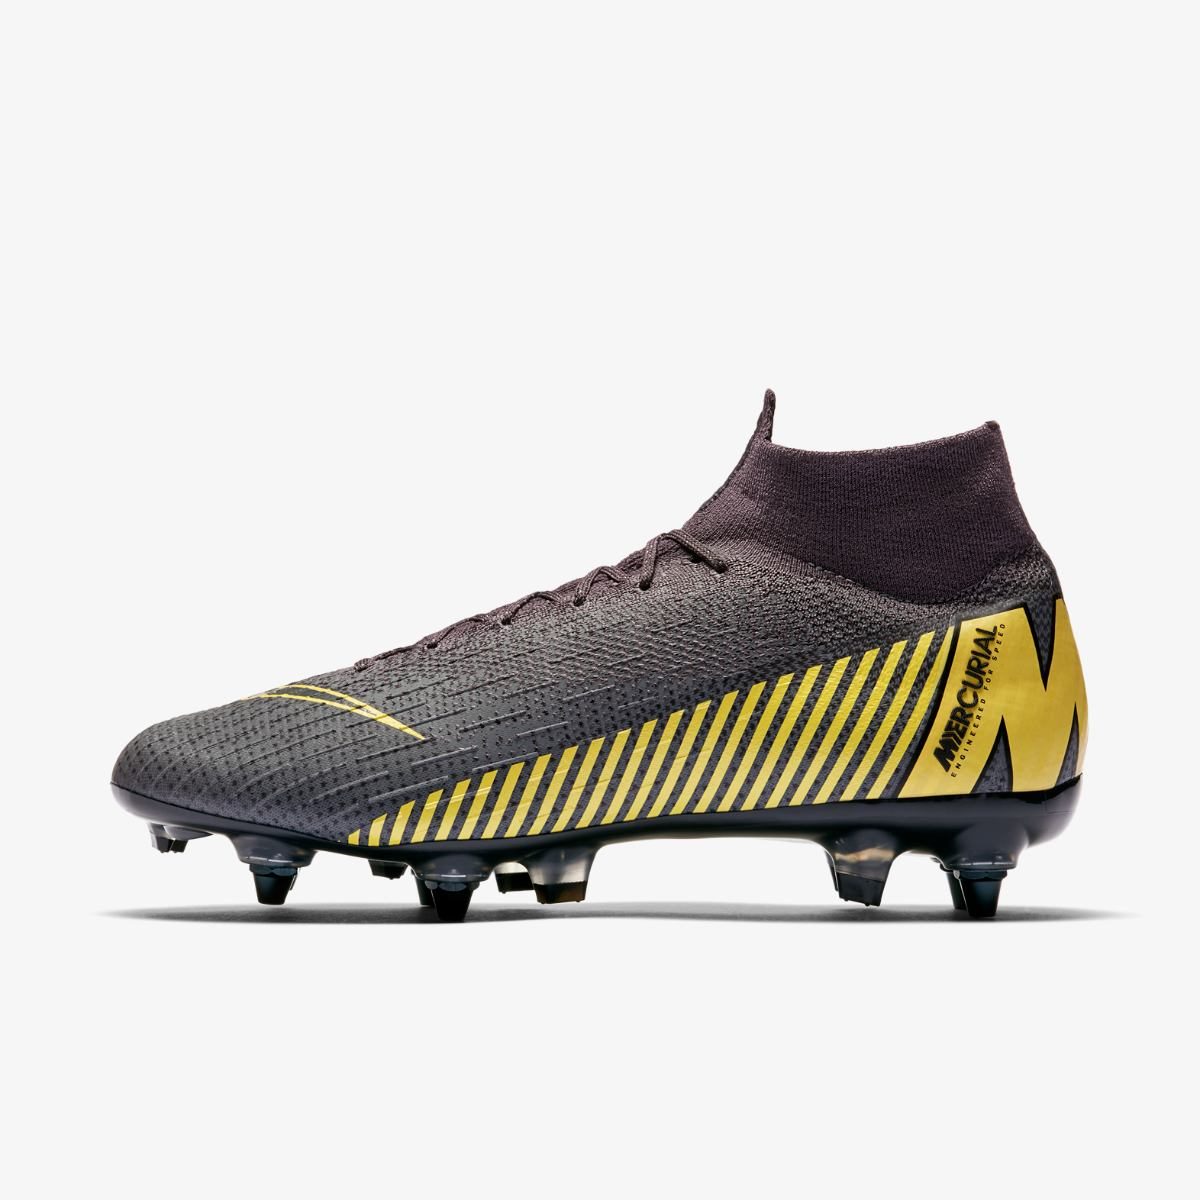 84c8e7ea Бутсы Nike SUPERFLY 6 ELITE SG-PRO AC AH7366-070 купить | deltasport.ua